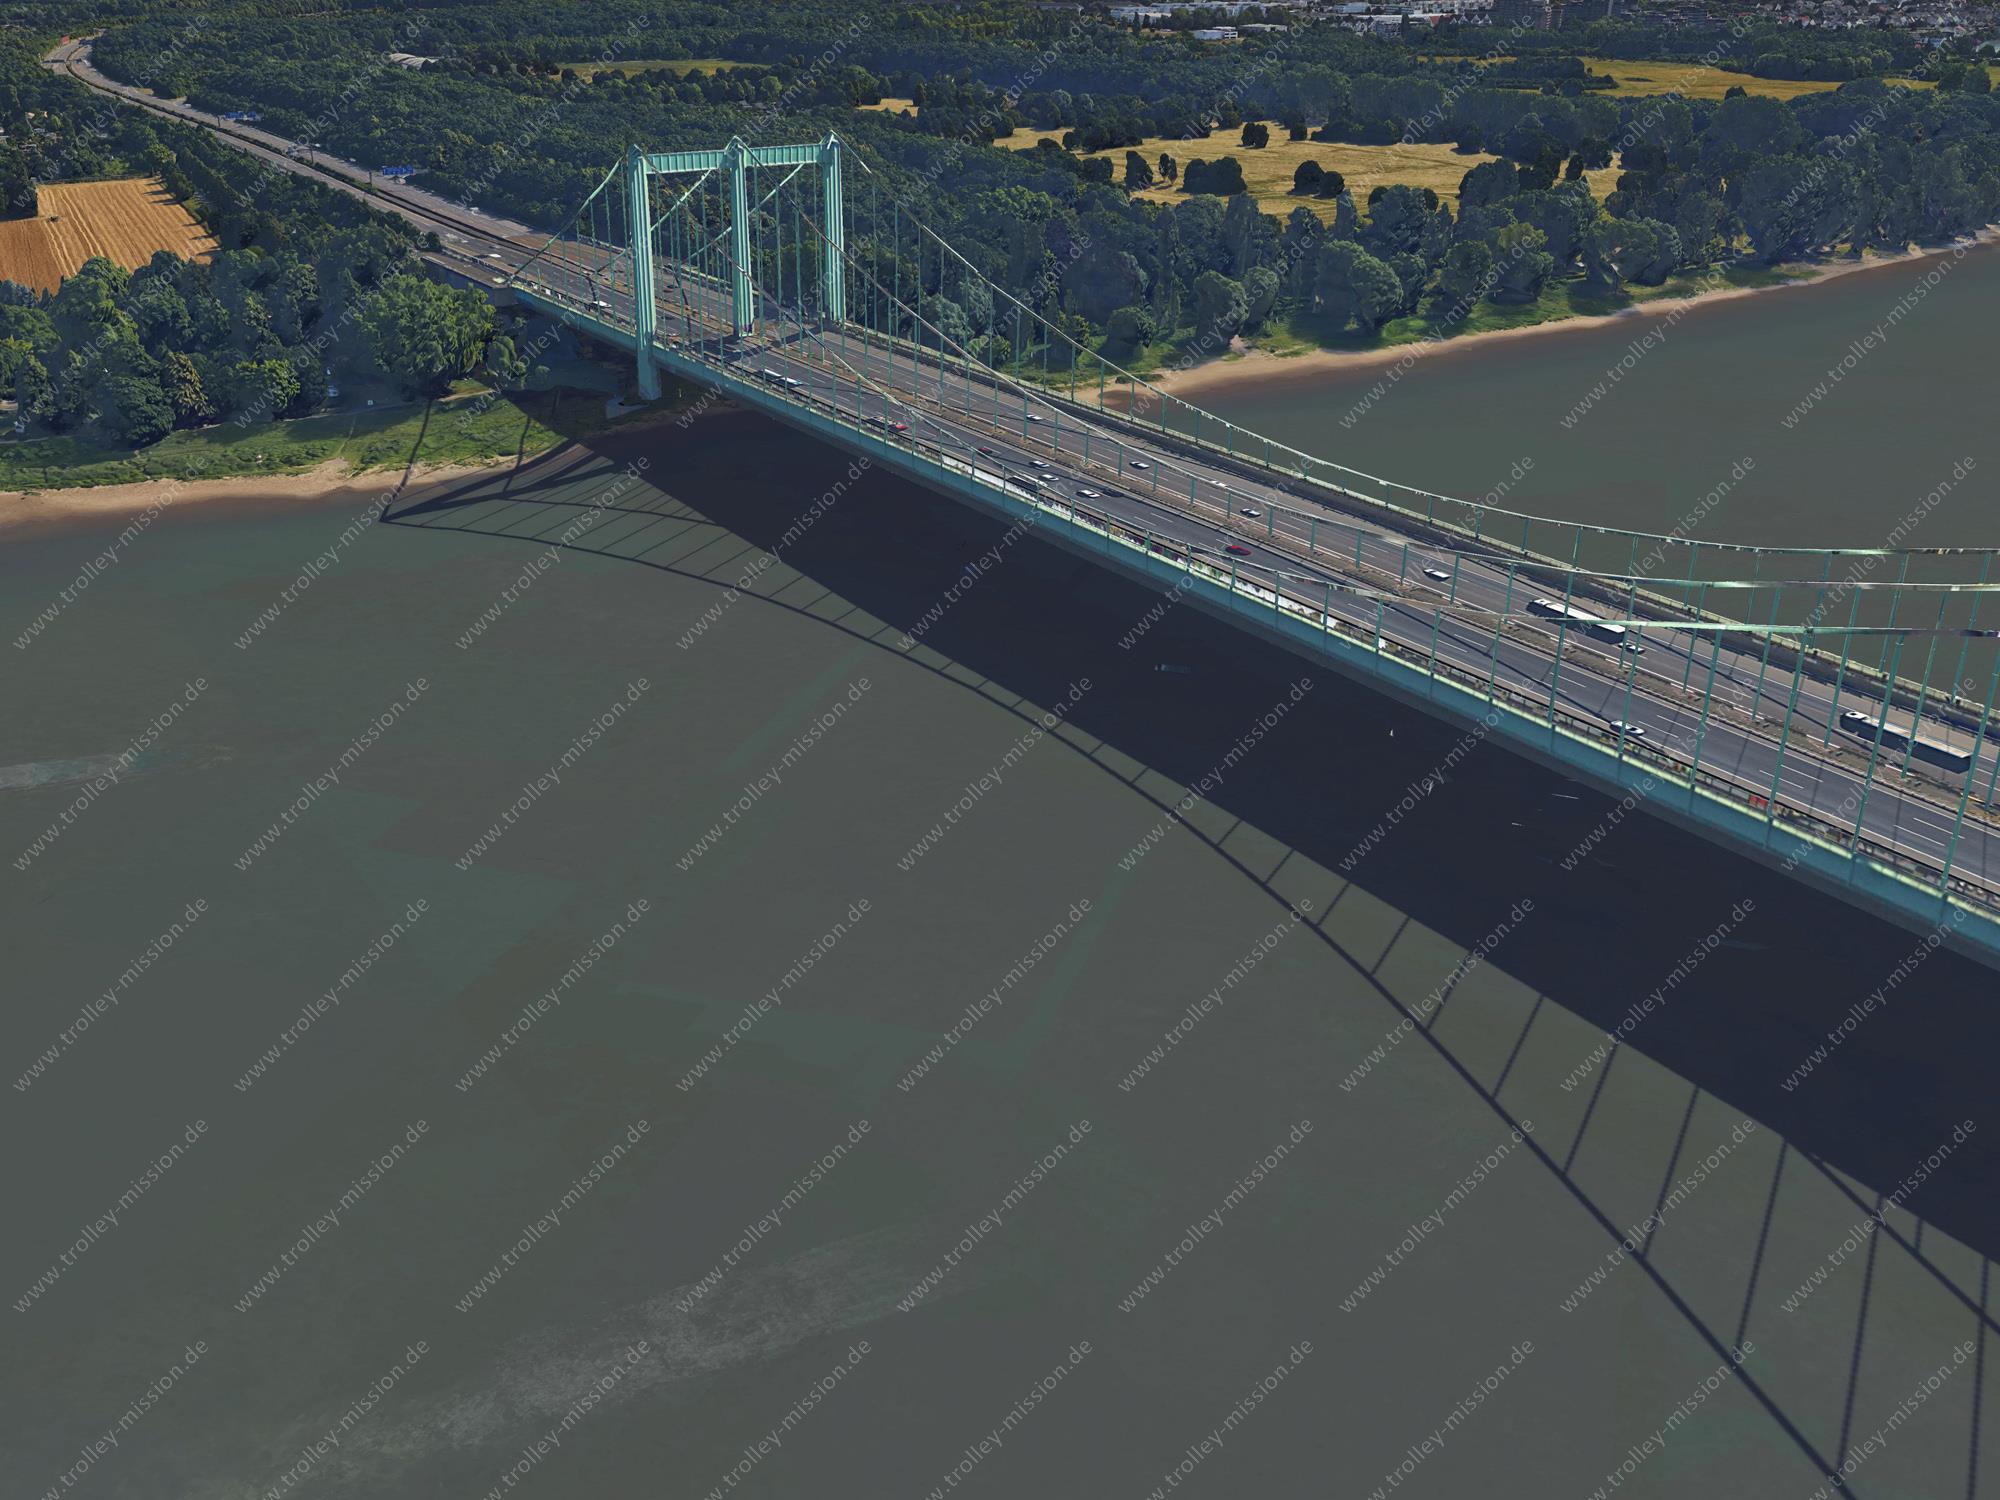 Autobahnbrücke in Köln-Rodenkirchen - Google Earth 2015